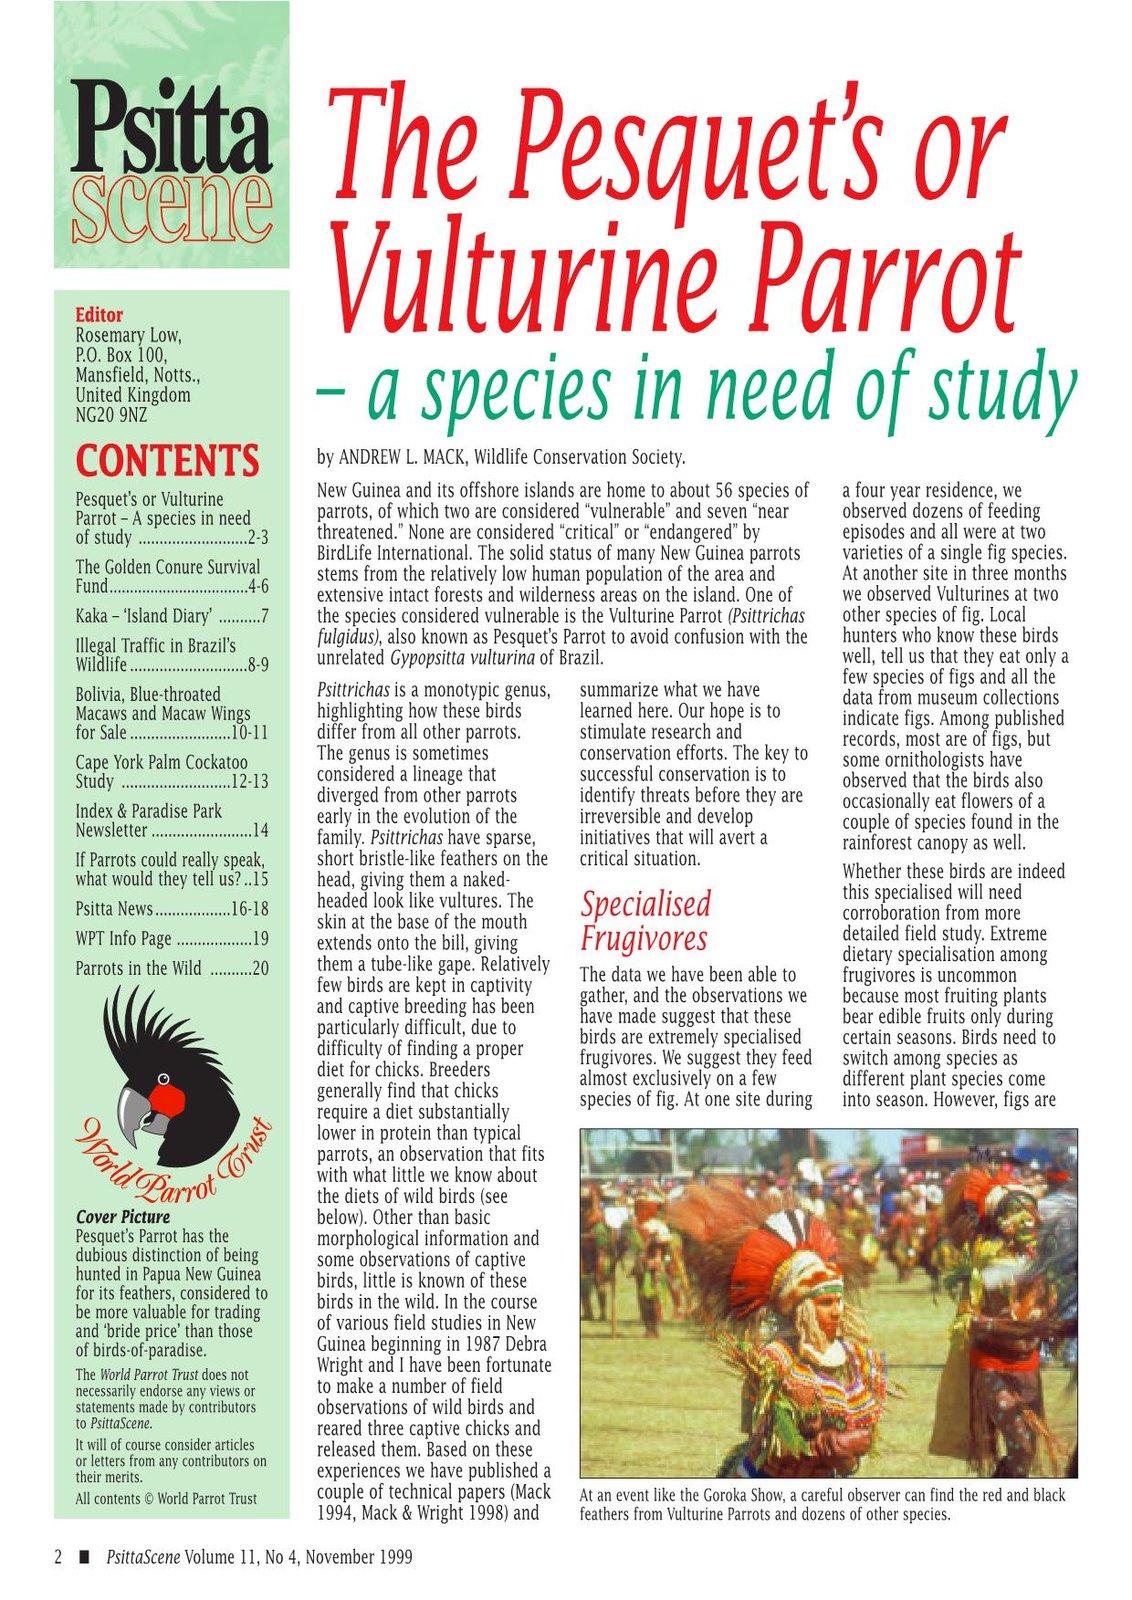 Pesquet's or Vulturine Parrot_3.jpg